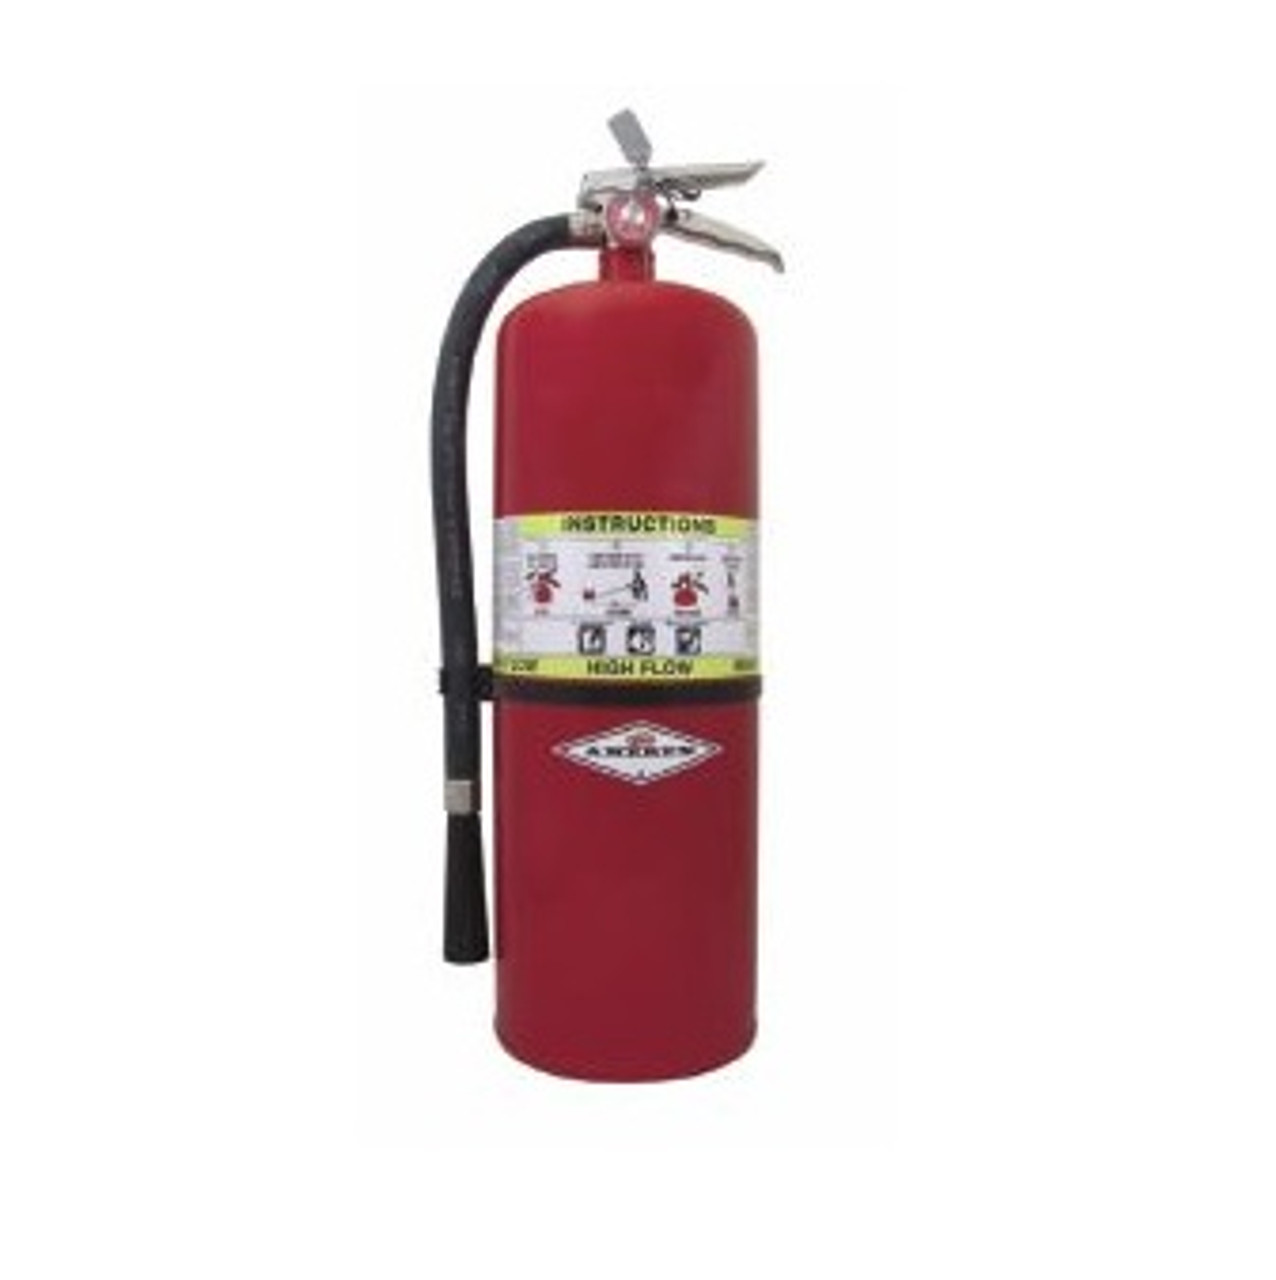 Amerex 762 - 20 lb Purple K High Flow Fire Extinguisher